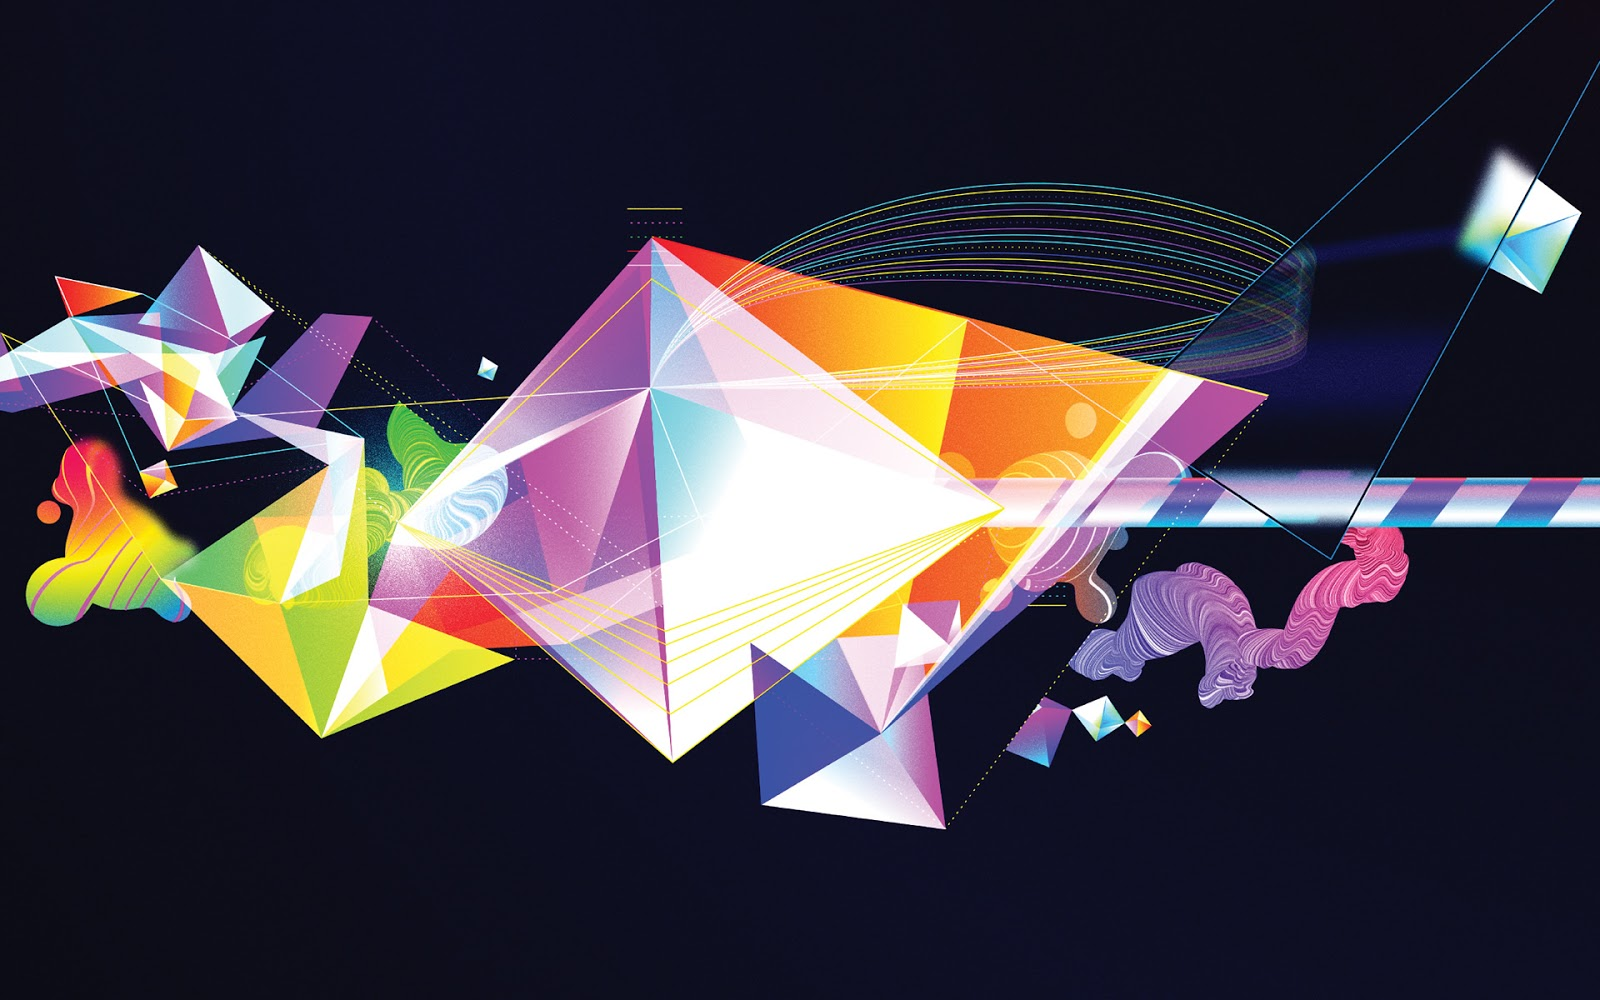 http://1.bp.blogspot.com/-_Xgw187TP08/UTgGKKDWDFI/AAAAAAAAbJ8/6lfQKzXAmFQ/s1600/Tetraedros+Digitales+-+Wallpapers+HD.jpg